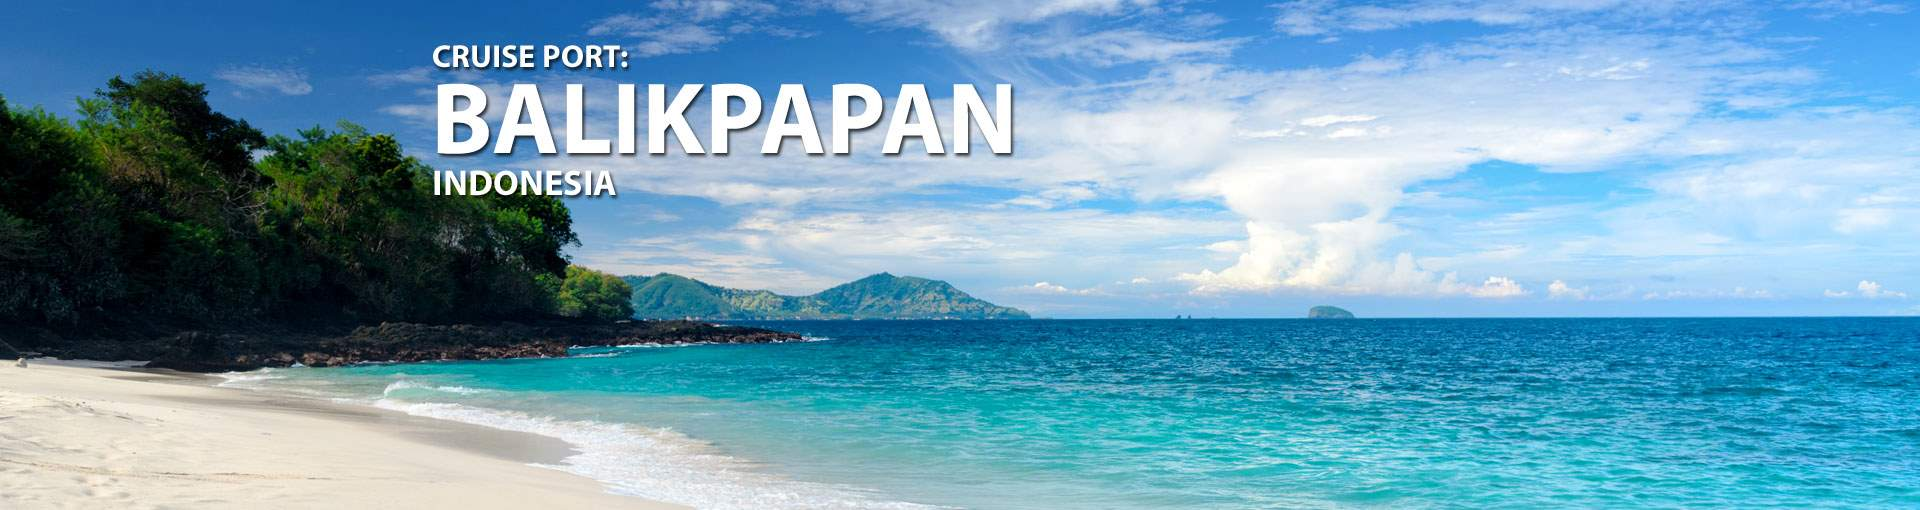 Cruises to Balikpapan, Indonesia